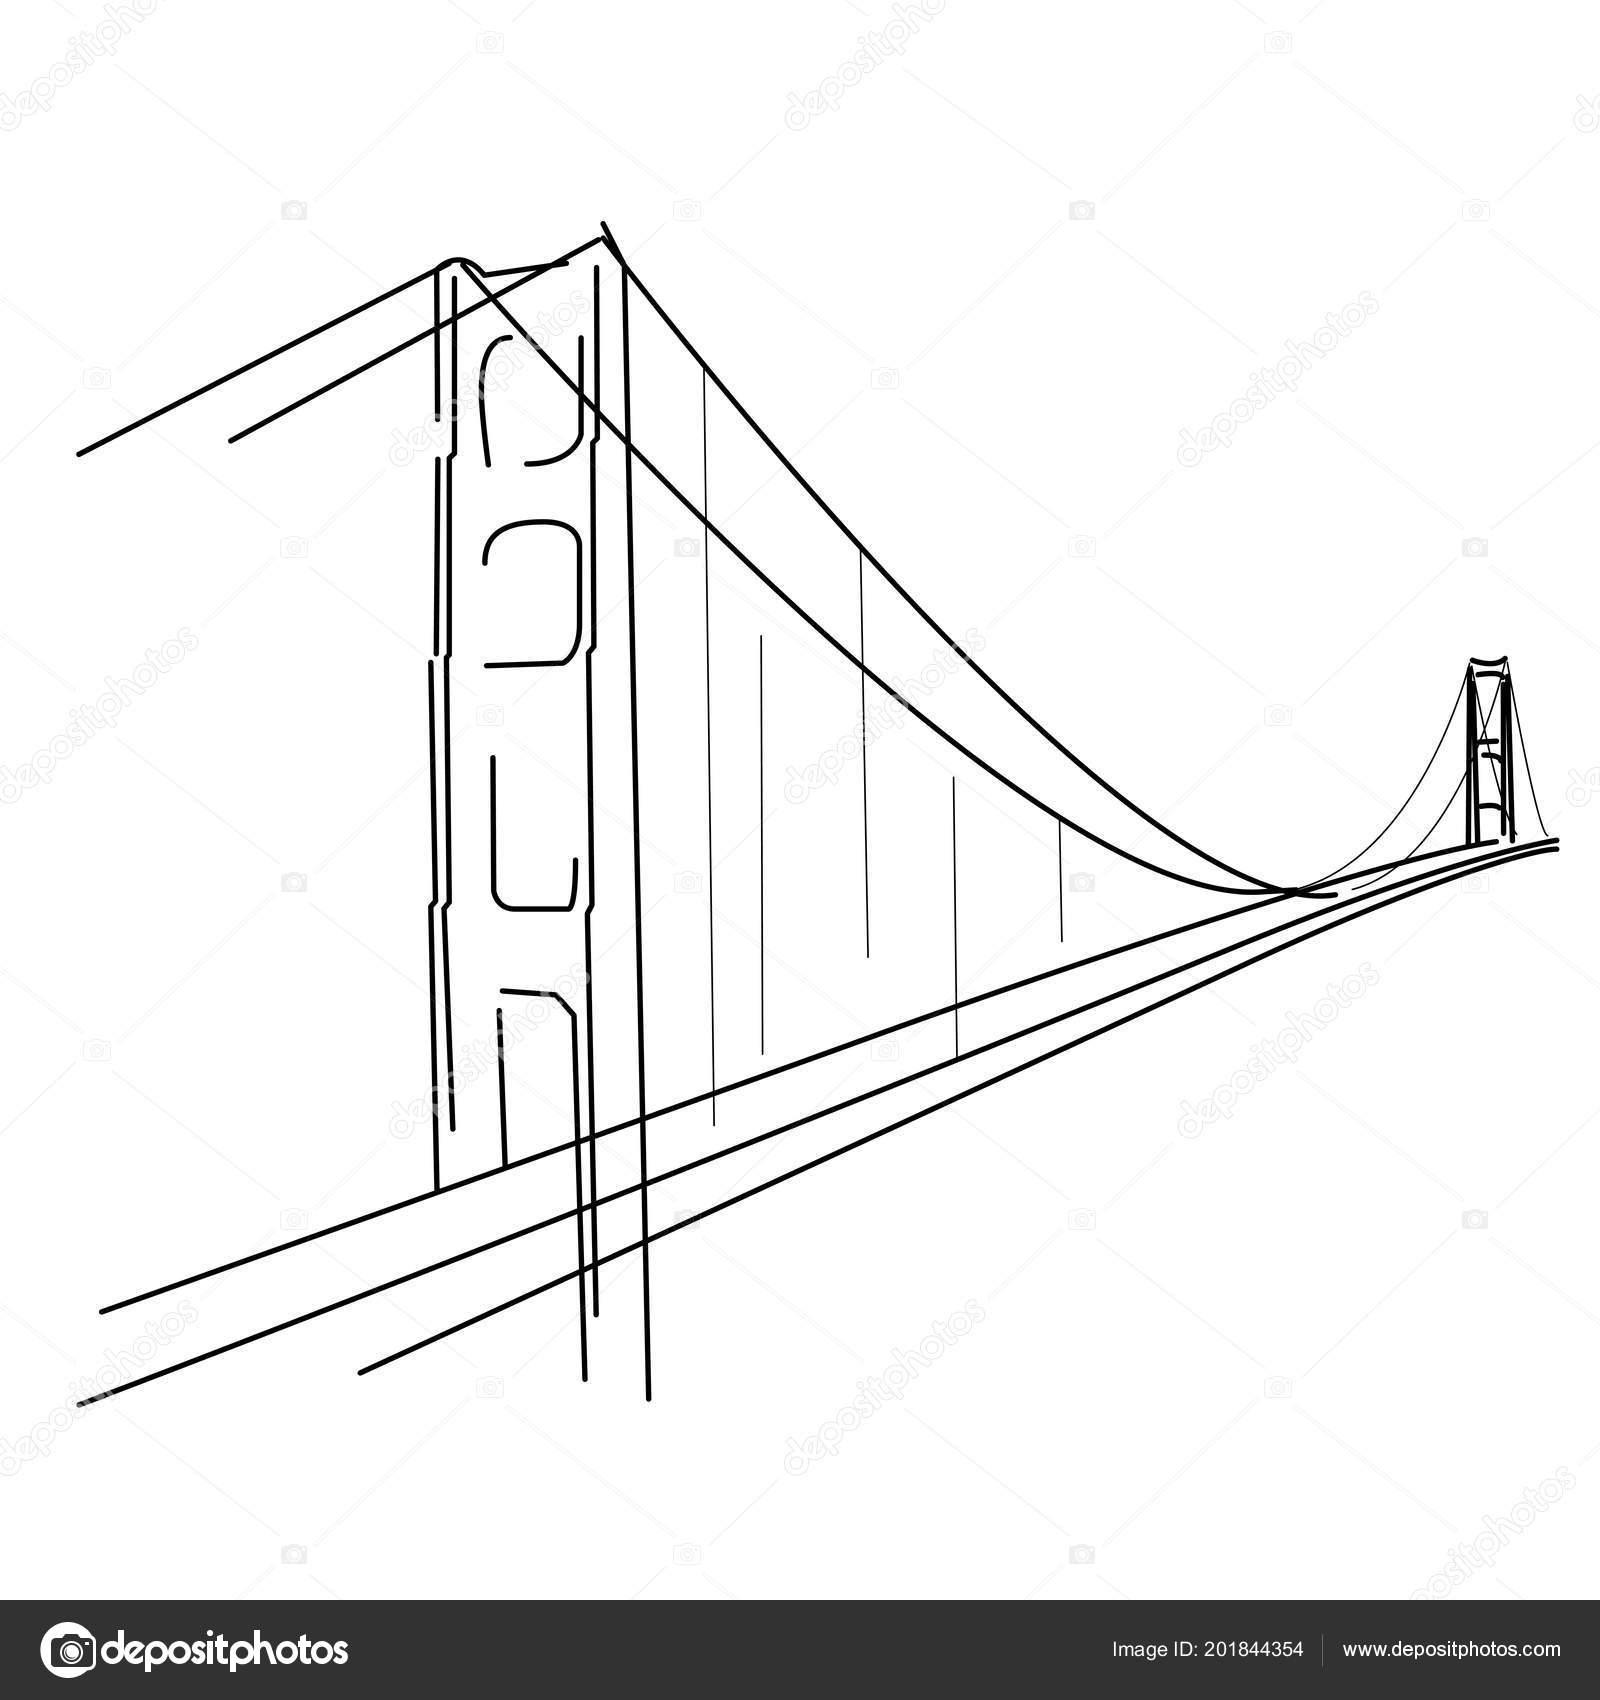 Dessin Du Pont De San Francisco croquis symbolique golden gate san francisco silhouette pont — image